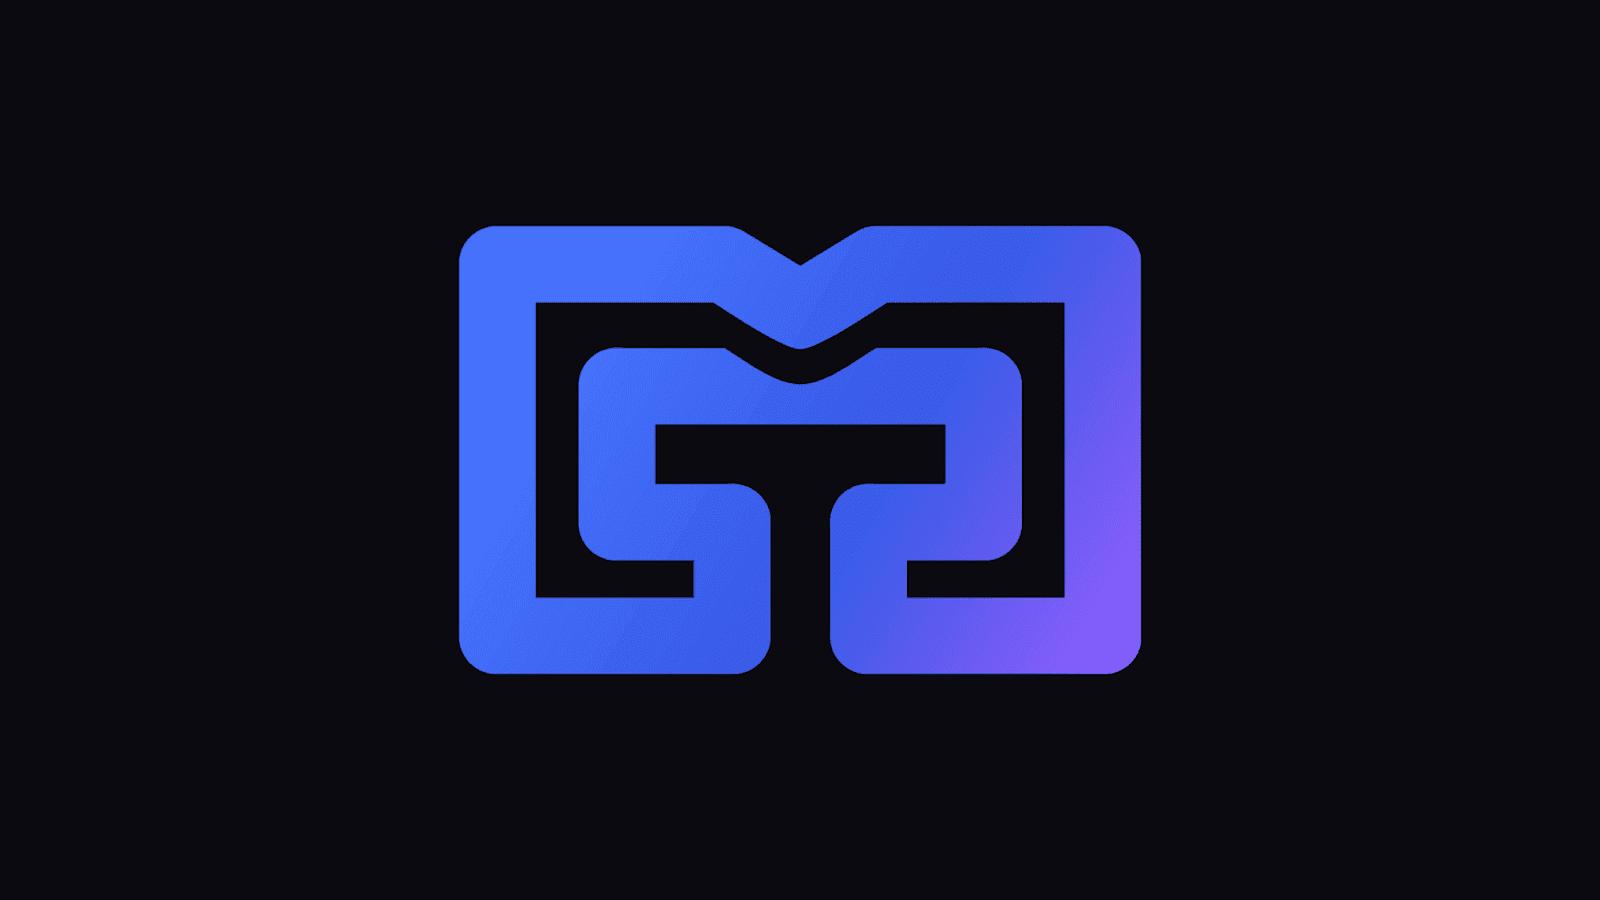 Box Shadow, Logo Masih Terjaga